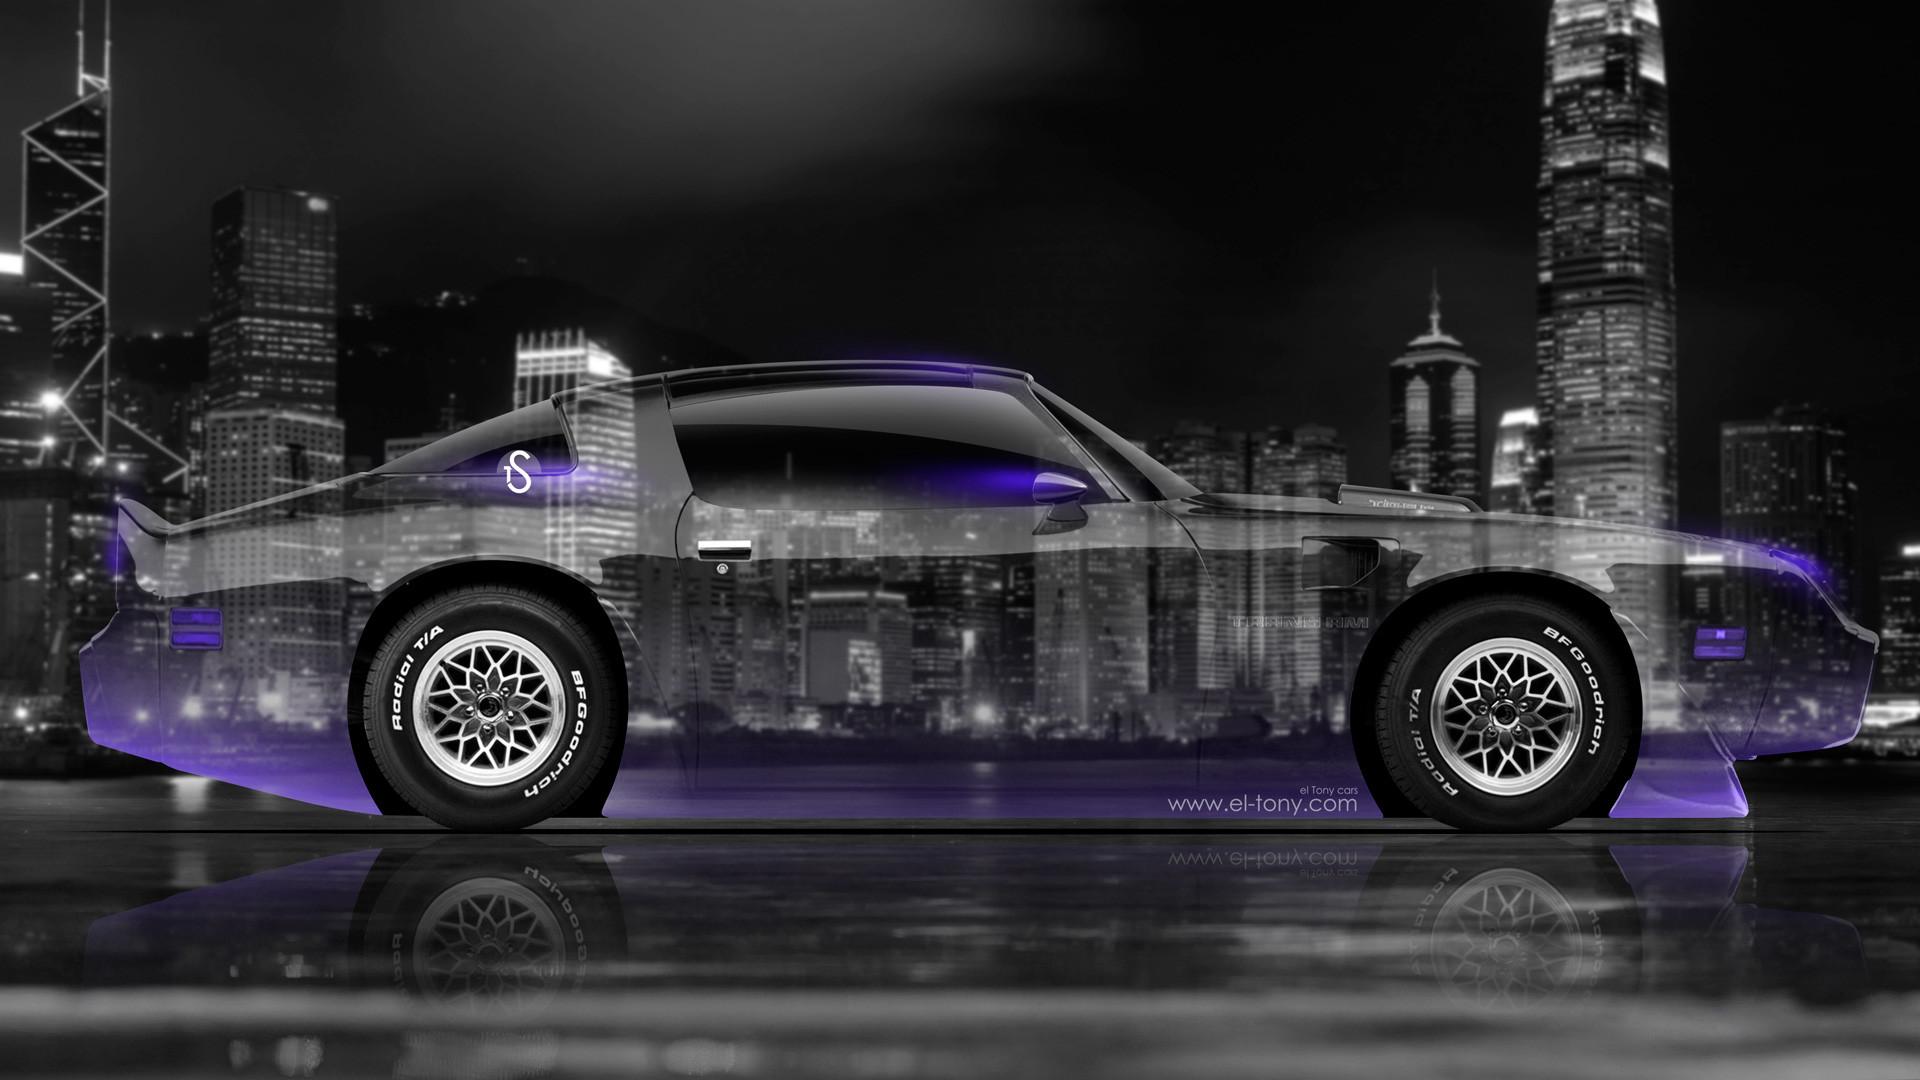 Res: 1920x1080, Pontiac-Firebird-Side-Crystal-City-Car-2014-Violet-